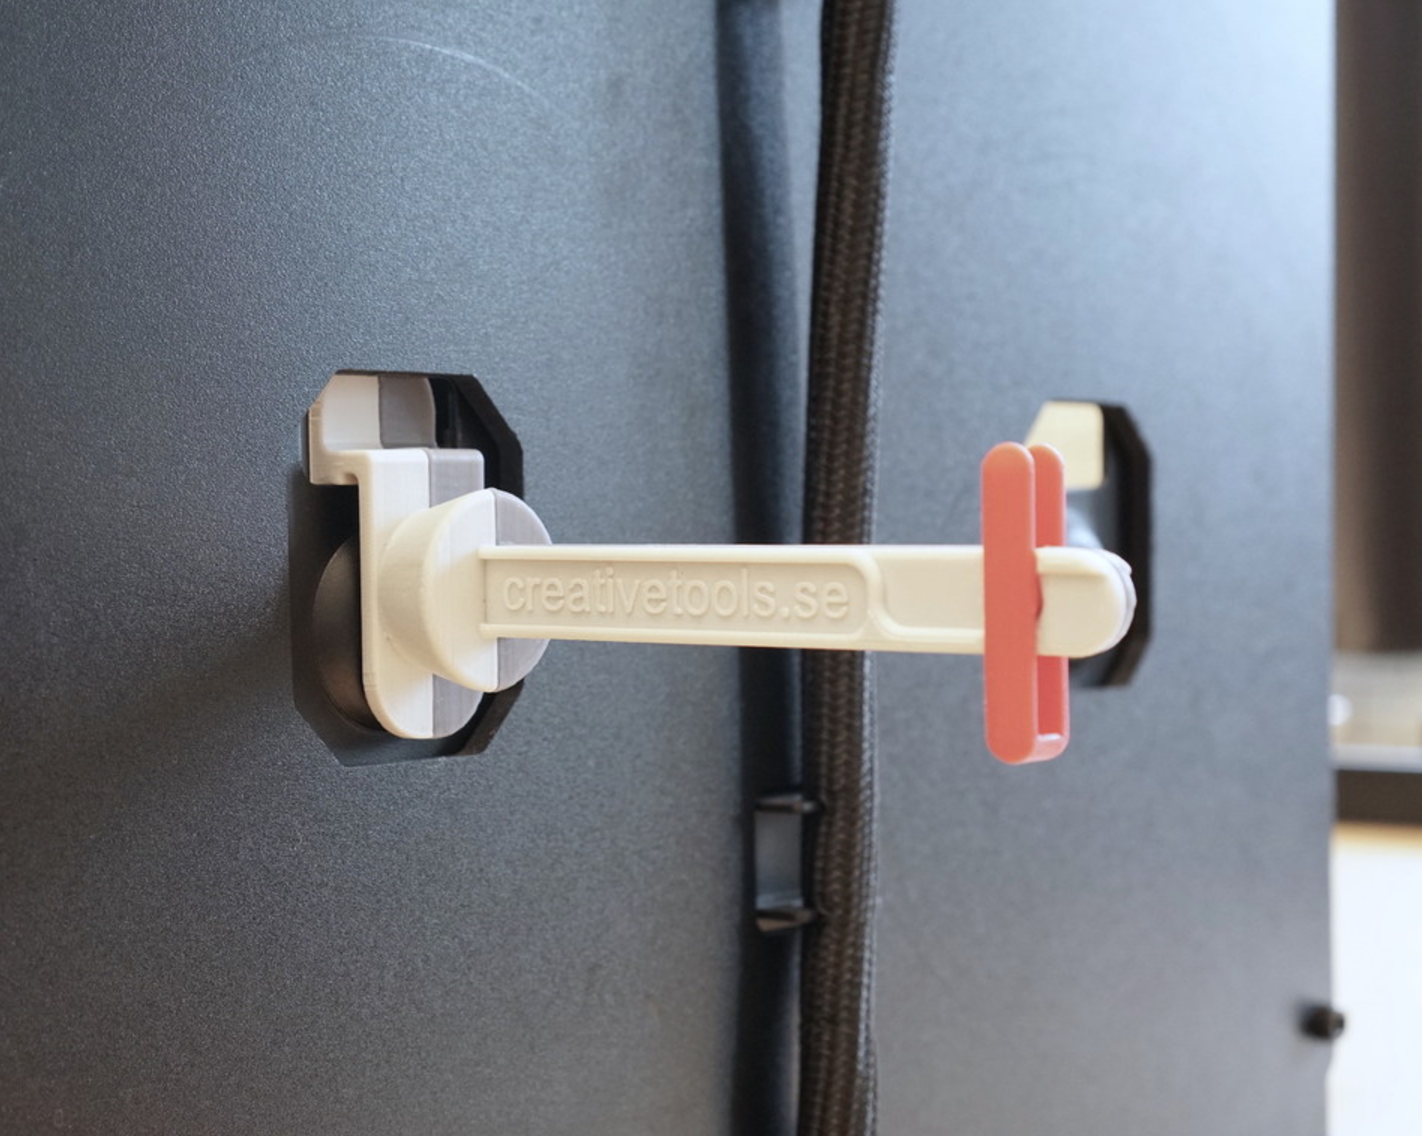 Capture d'écran 2017-05-09 à 09.44.32.png Download free STL file Universal Cantilevered Spool Holder for 3D printers • 3D printing design, CreativeTools